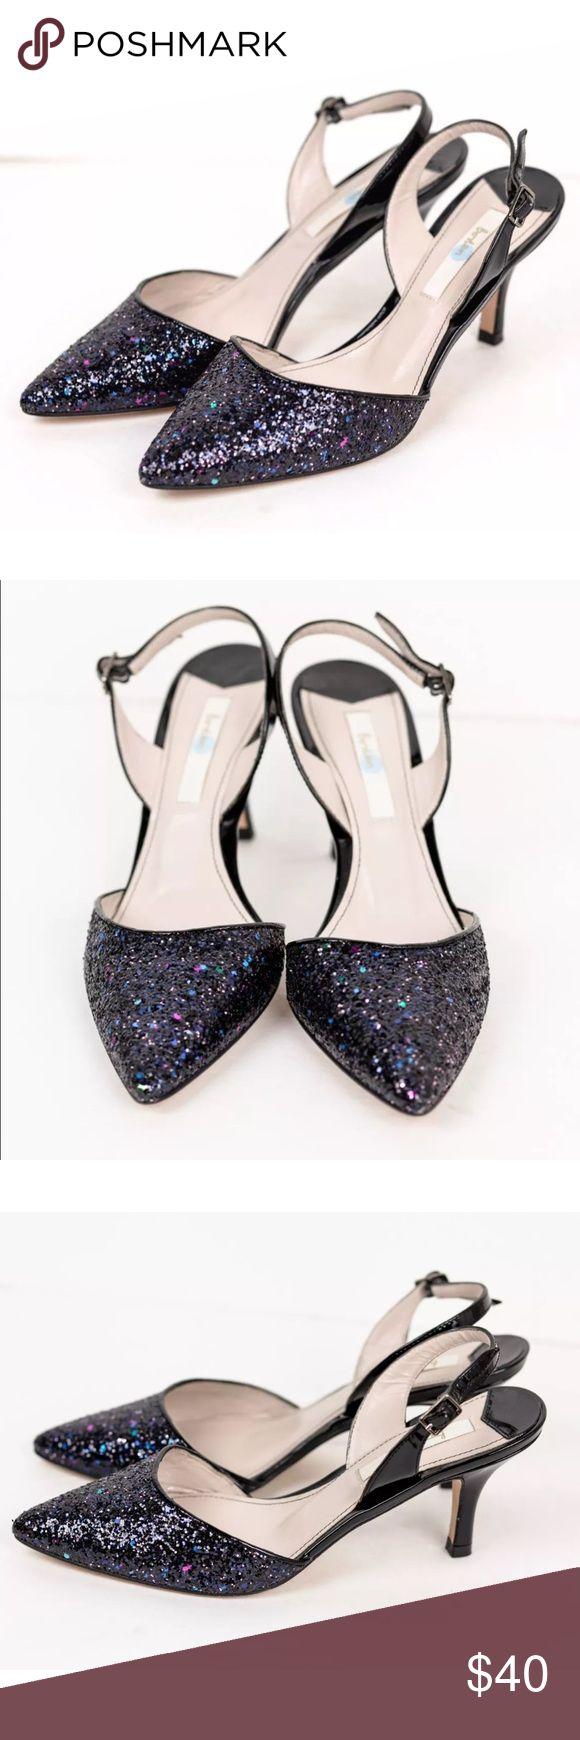 BODEN Slingback Black Glitter Iridescent Heels BODEN Slingback Black Glitter Iridescent Leather Heels Pumps Size 36 NWOB Boden Shoes Heels